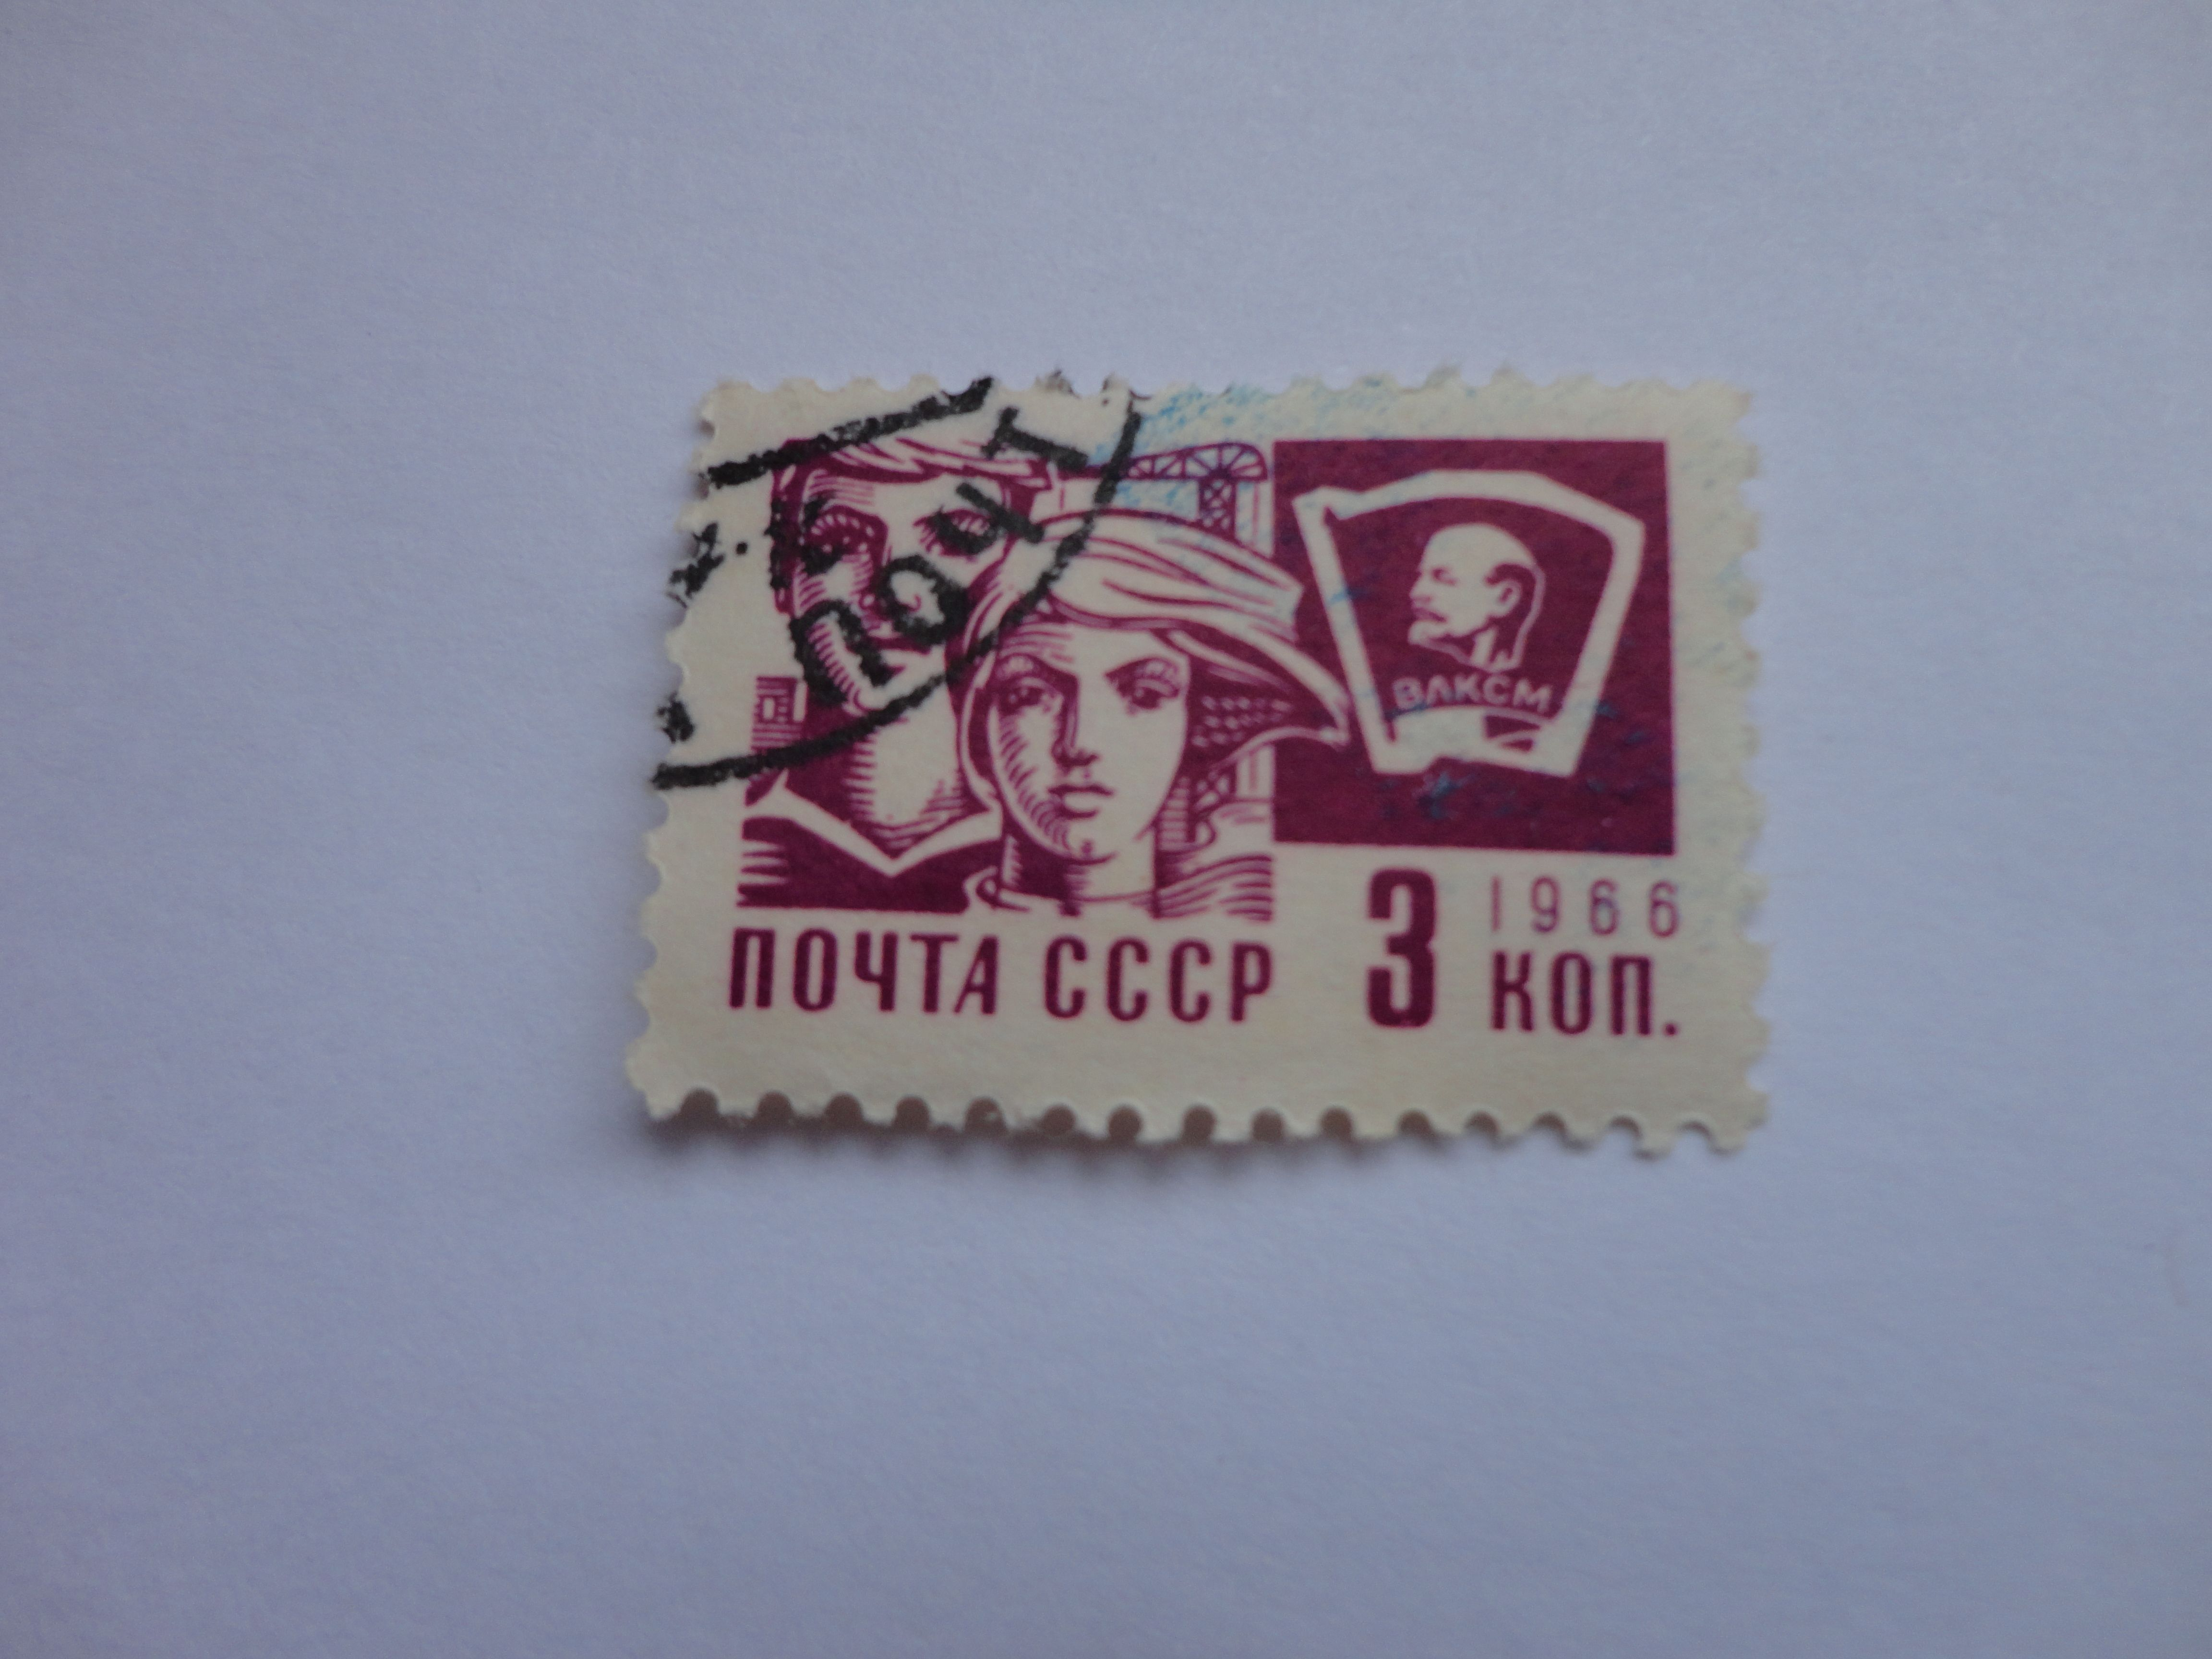 3 Kon 1966 Noyta CCCP Postage Stamp | Philatelist / Postage